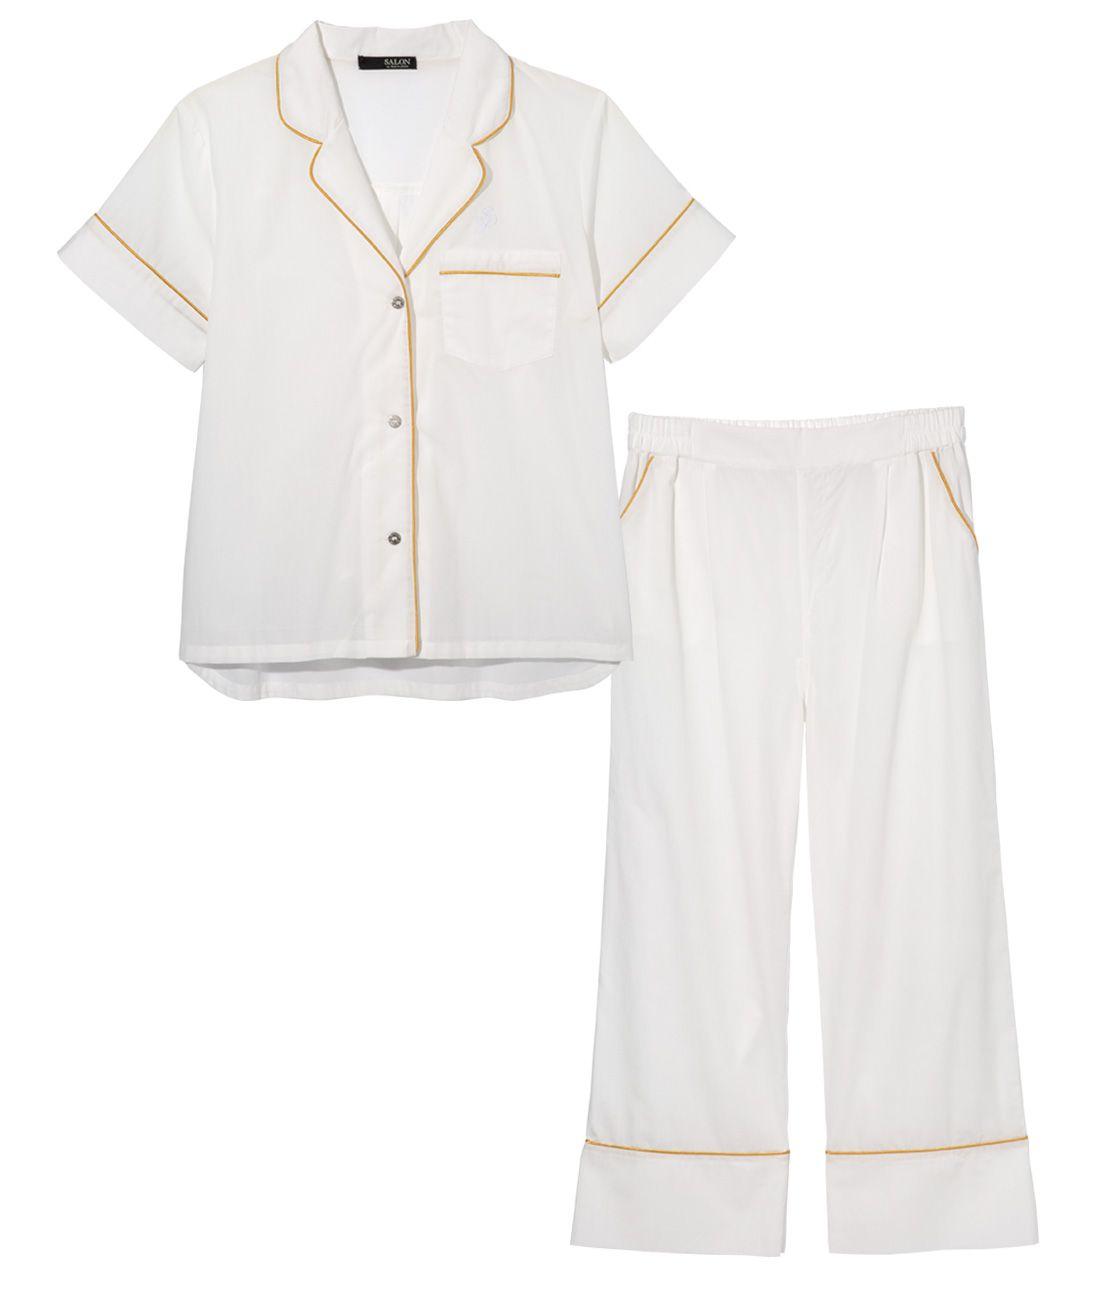 Ice Cotton (R) short-sleeved shirt pajamas